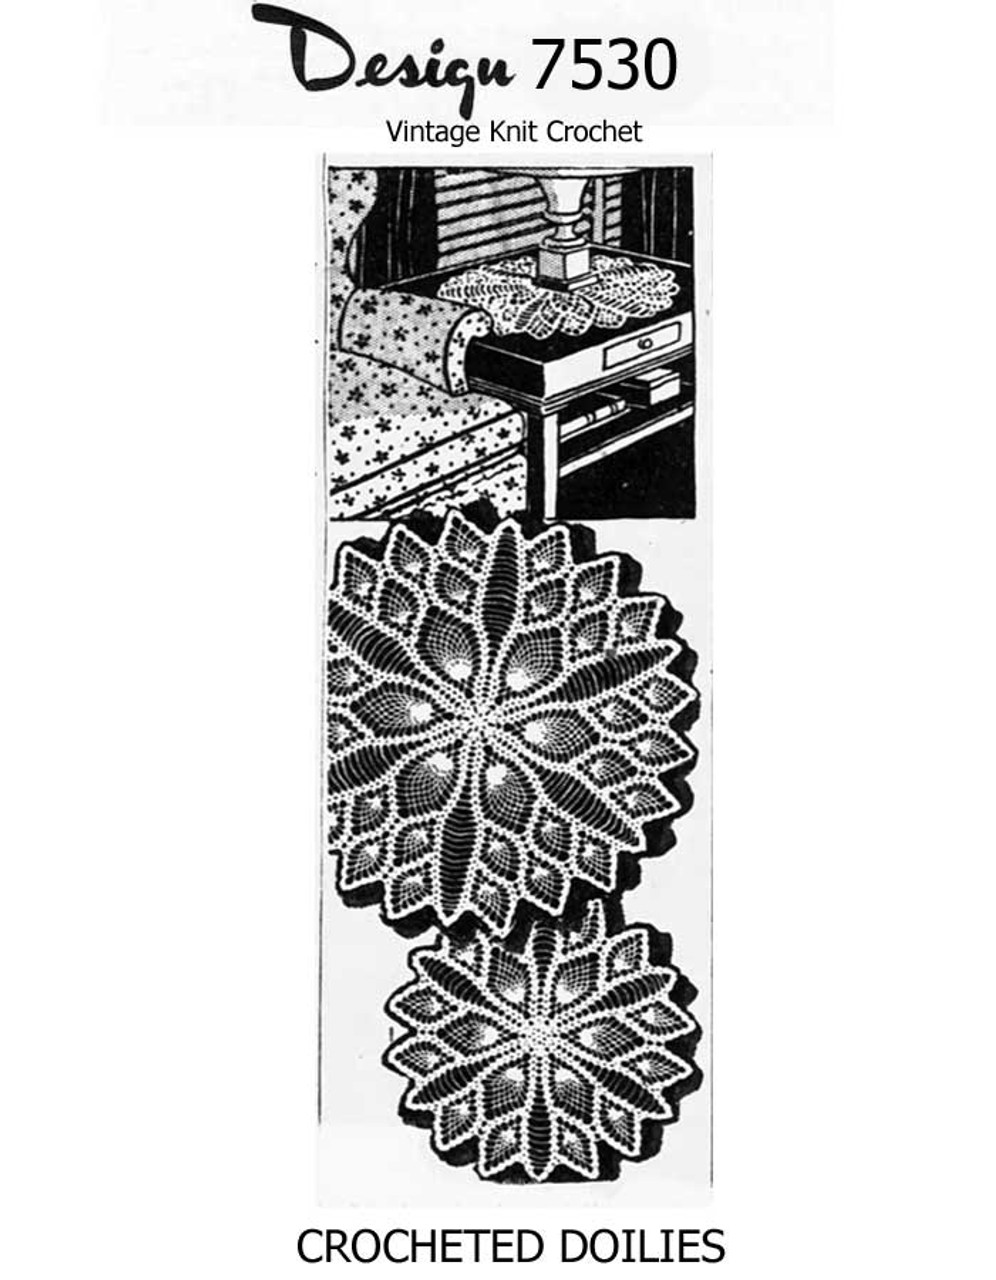 Crochet Pineapple Luncheon Set Pattern, Design 7530, Alice Brooks